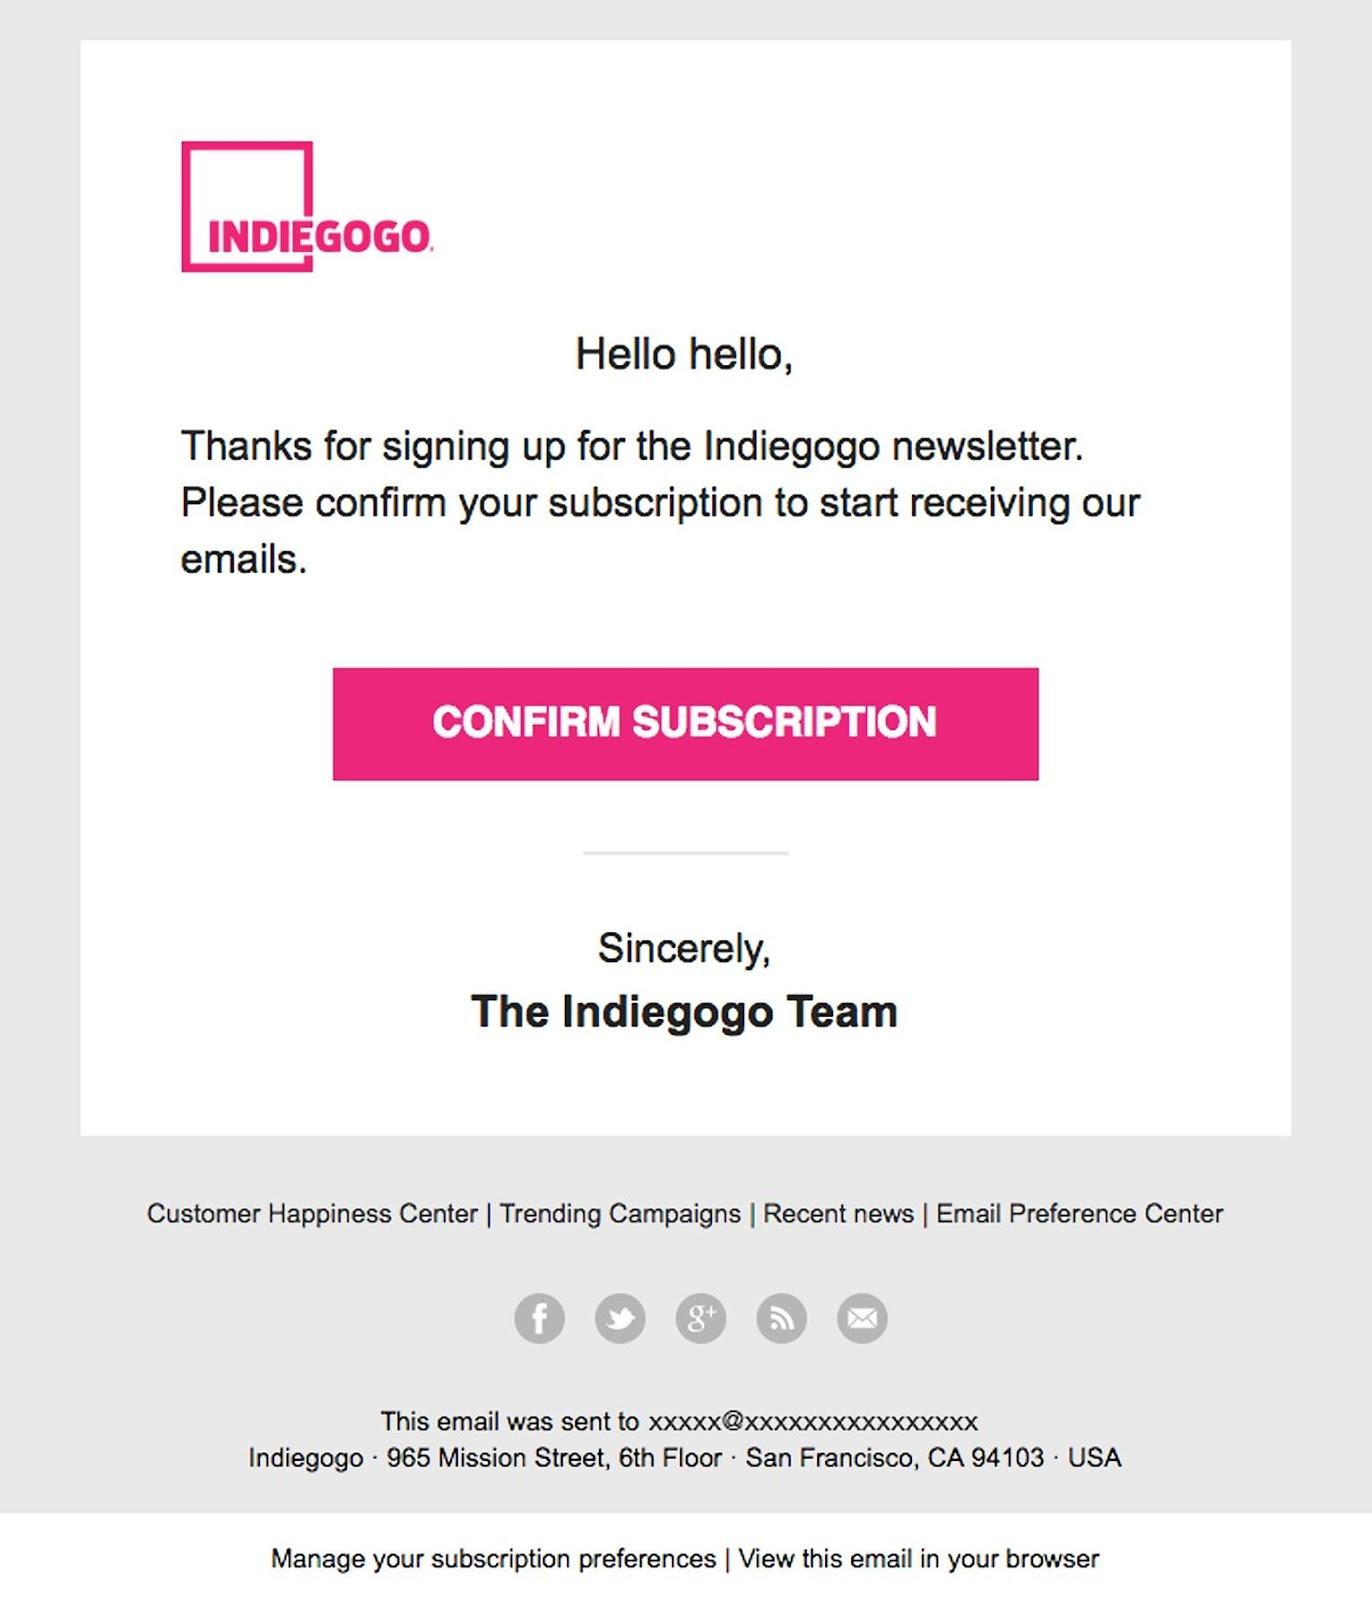 indiegogo newsletter signup